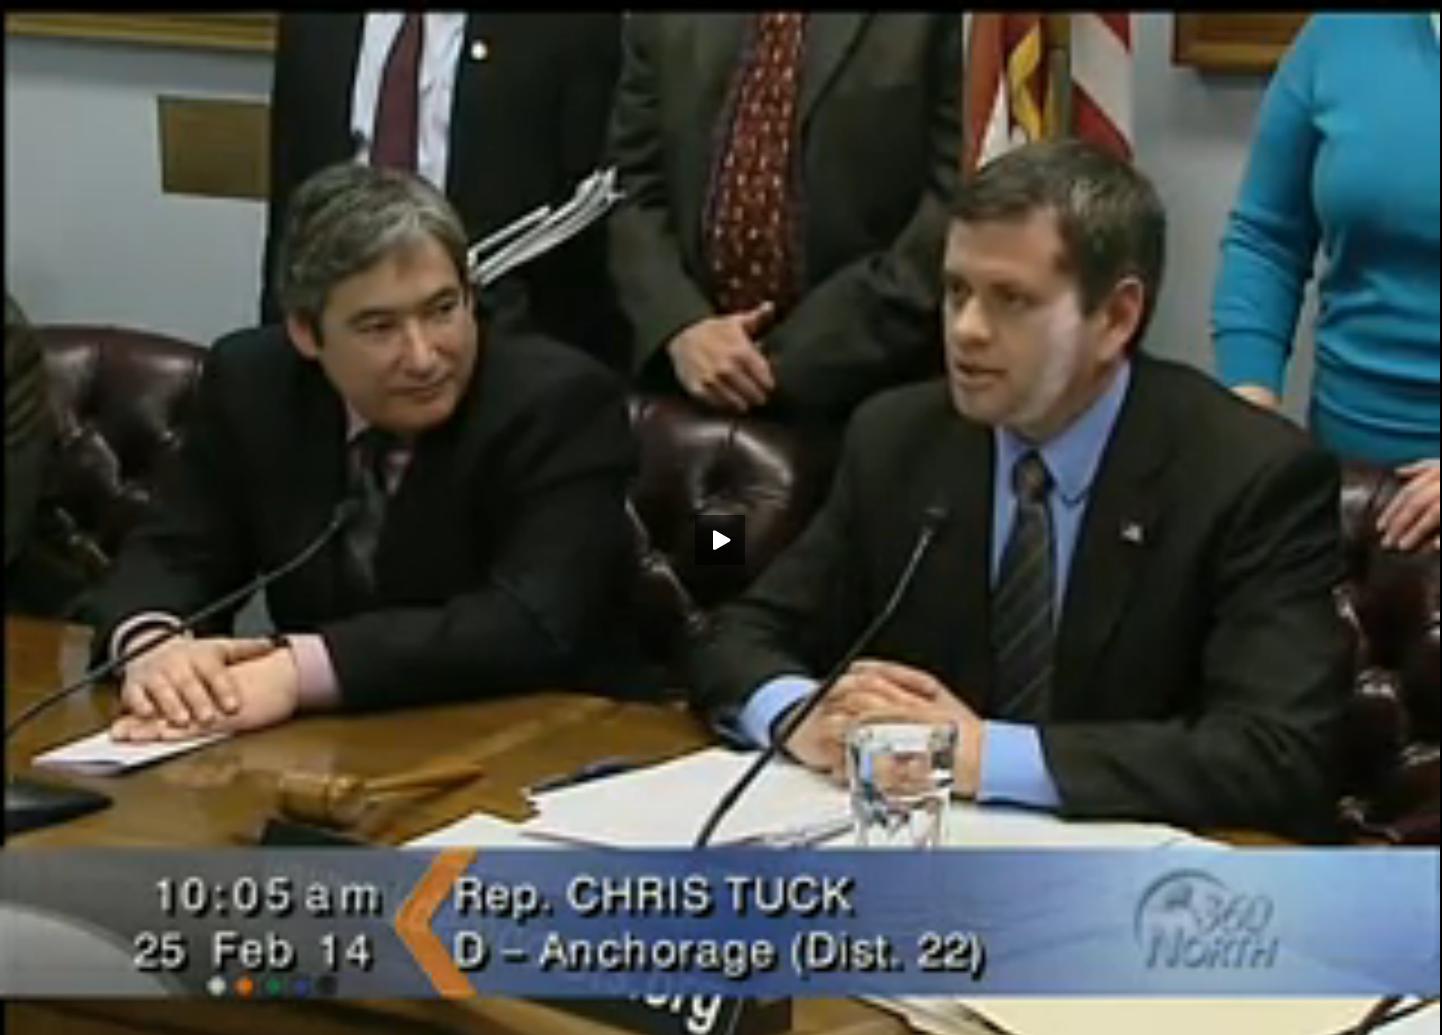 Chris Tuck and Sam Kito III during the February 25, 2014 House Minority Press Availability. Screenshot courtesy of Gavel Alaska.